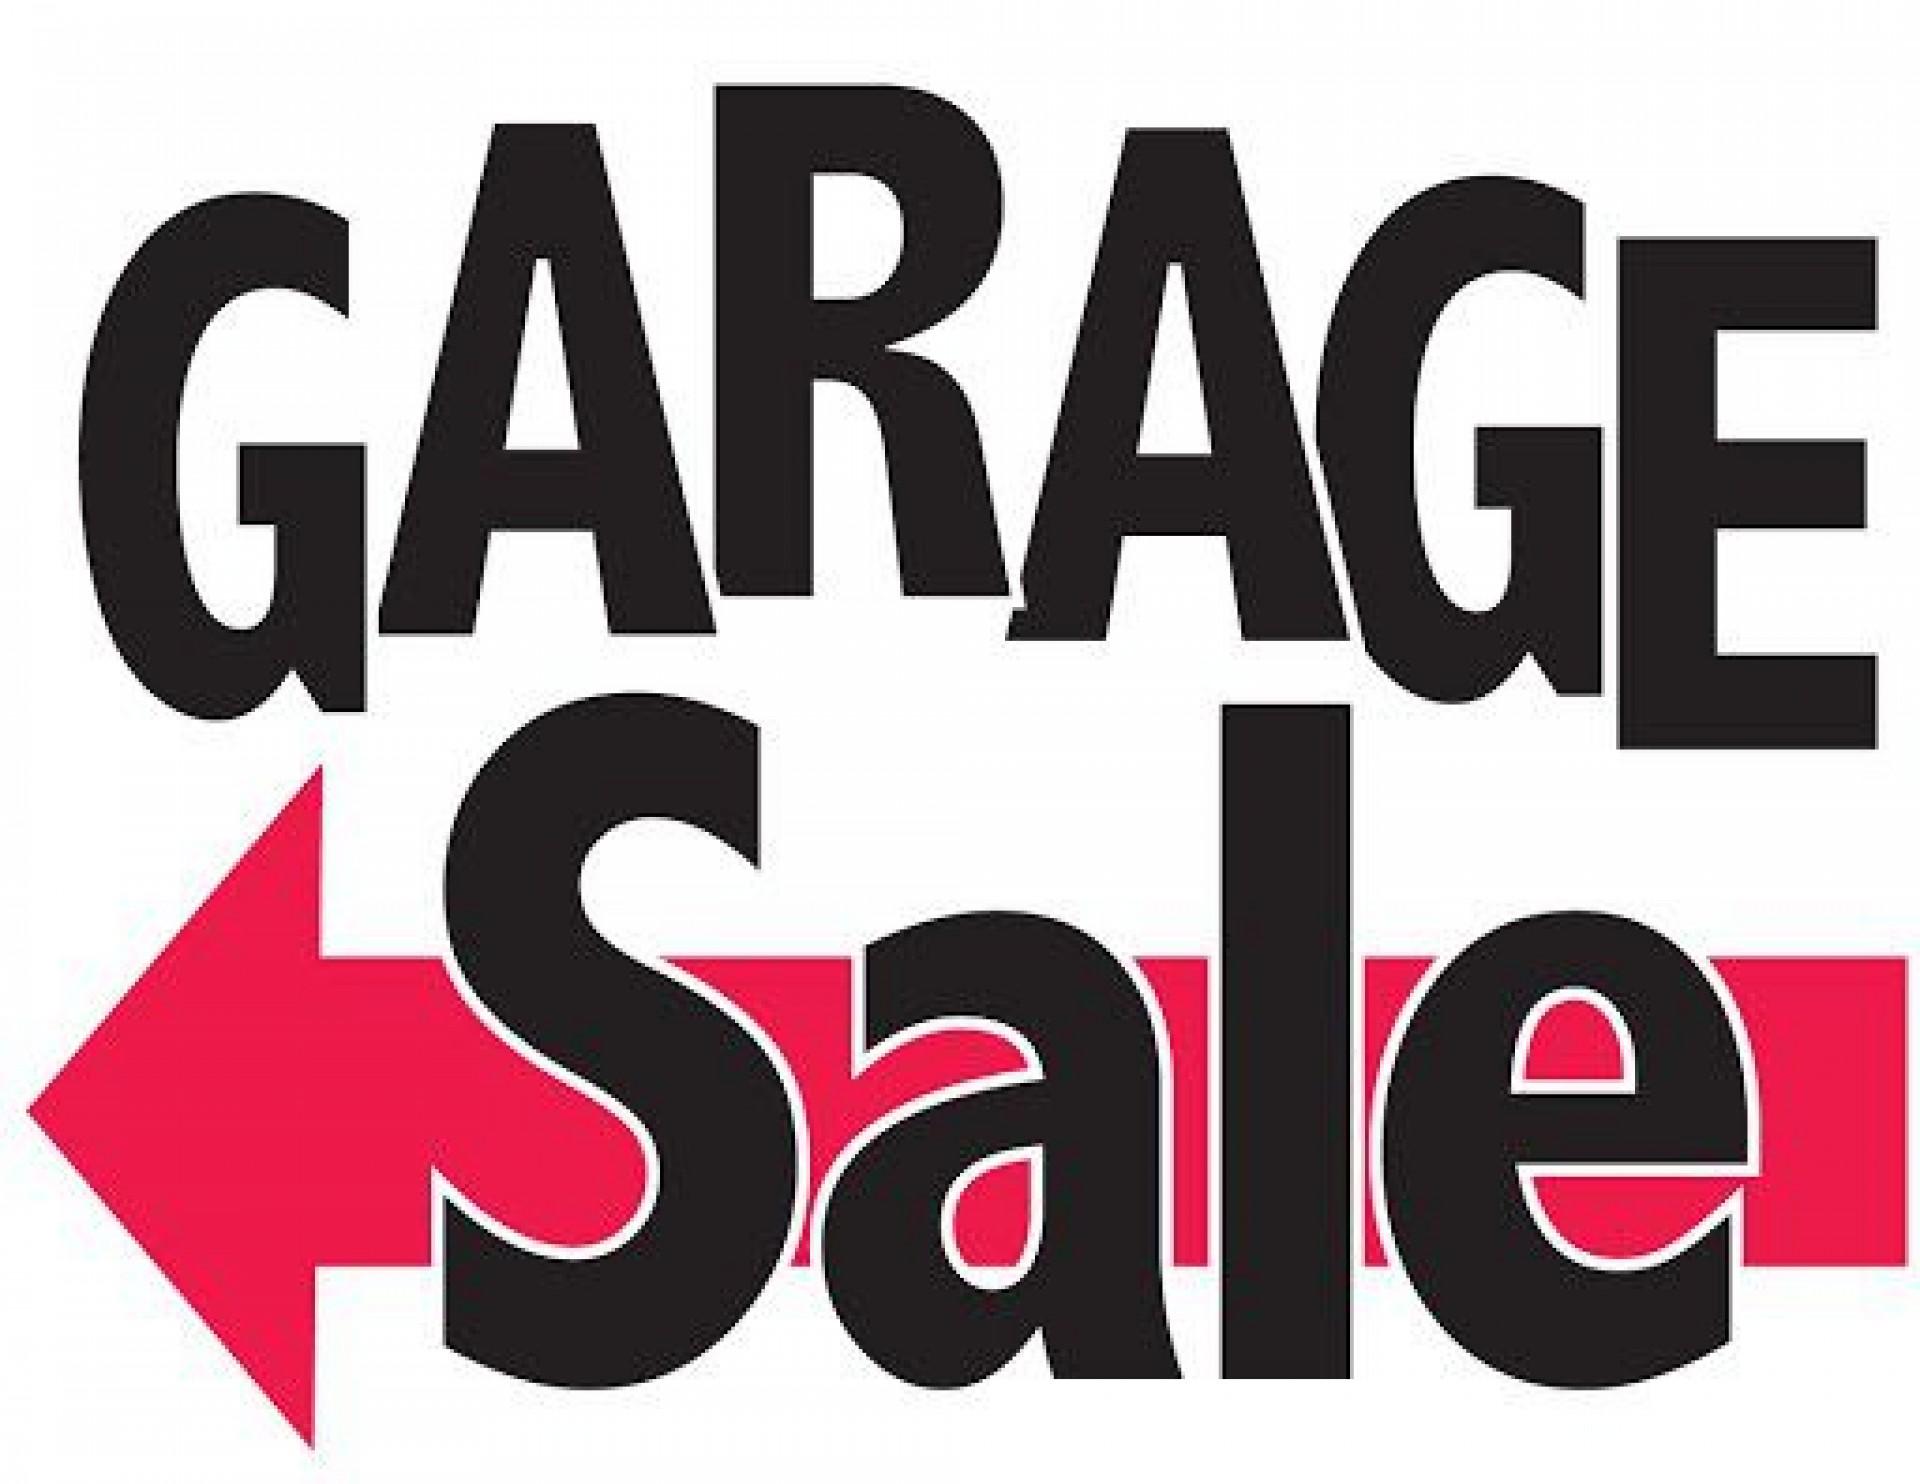 002 Dreaded Garage Sale Sign Template High Def  Free Flyer Microsoft Word Yard1920